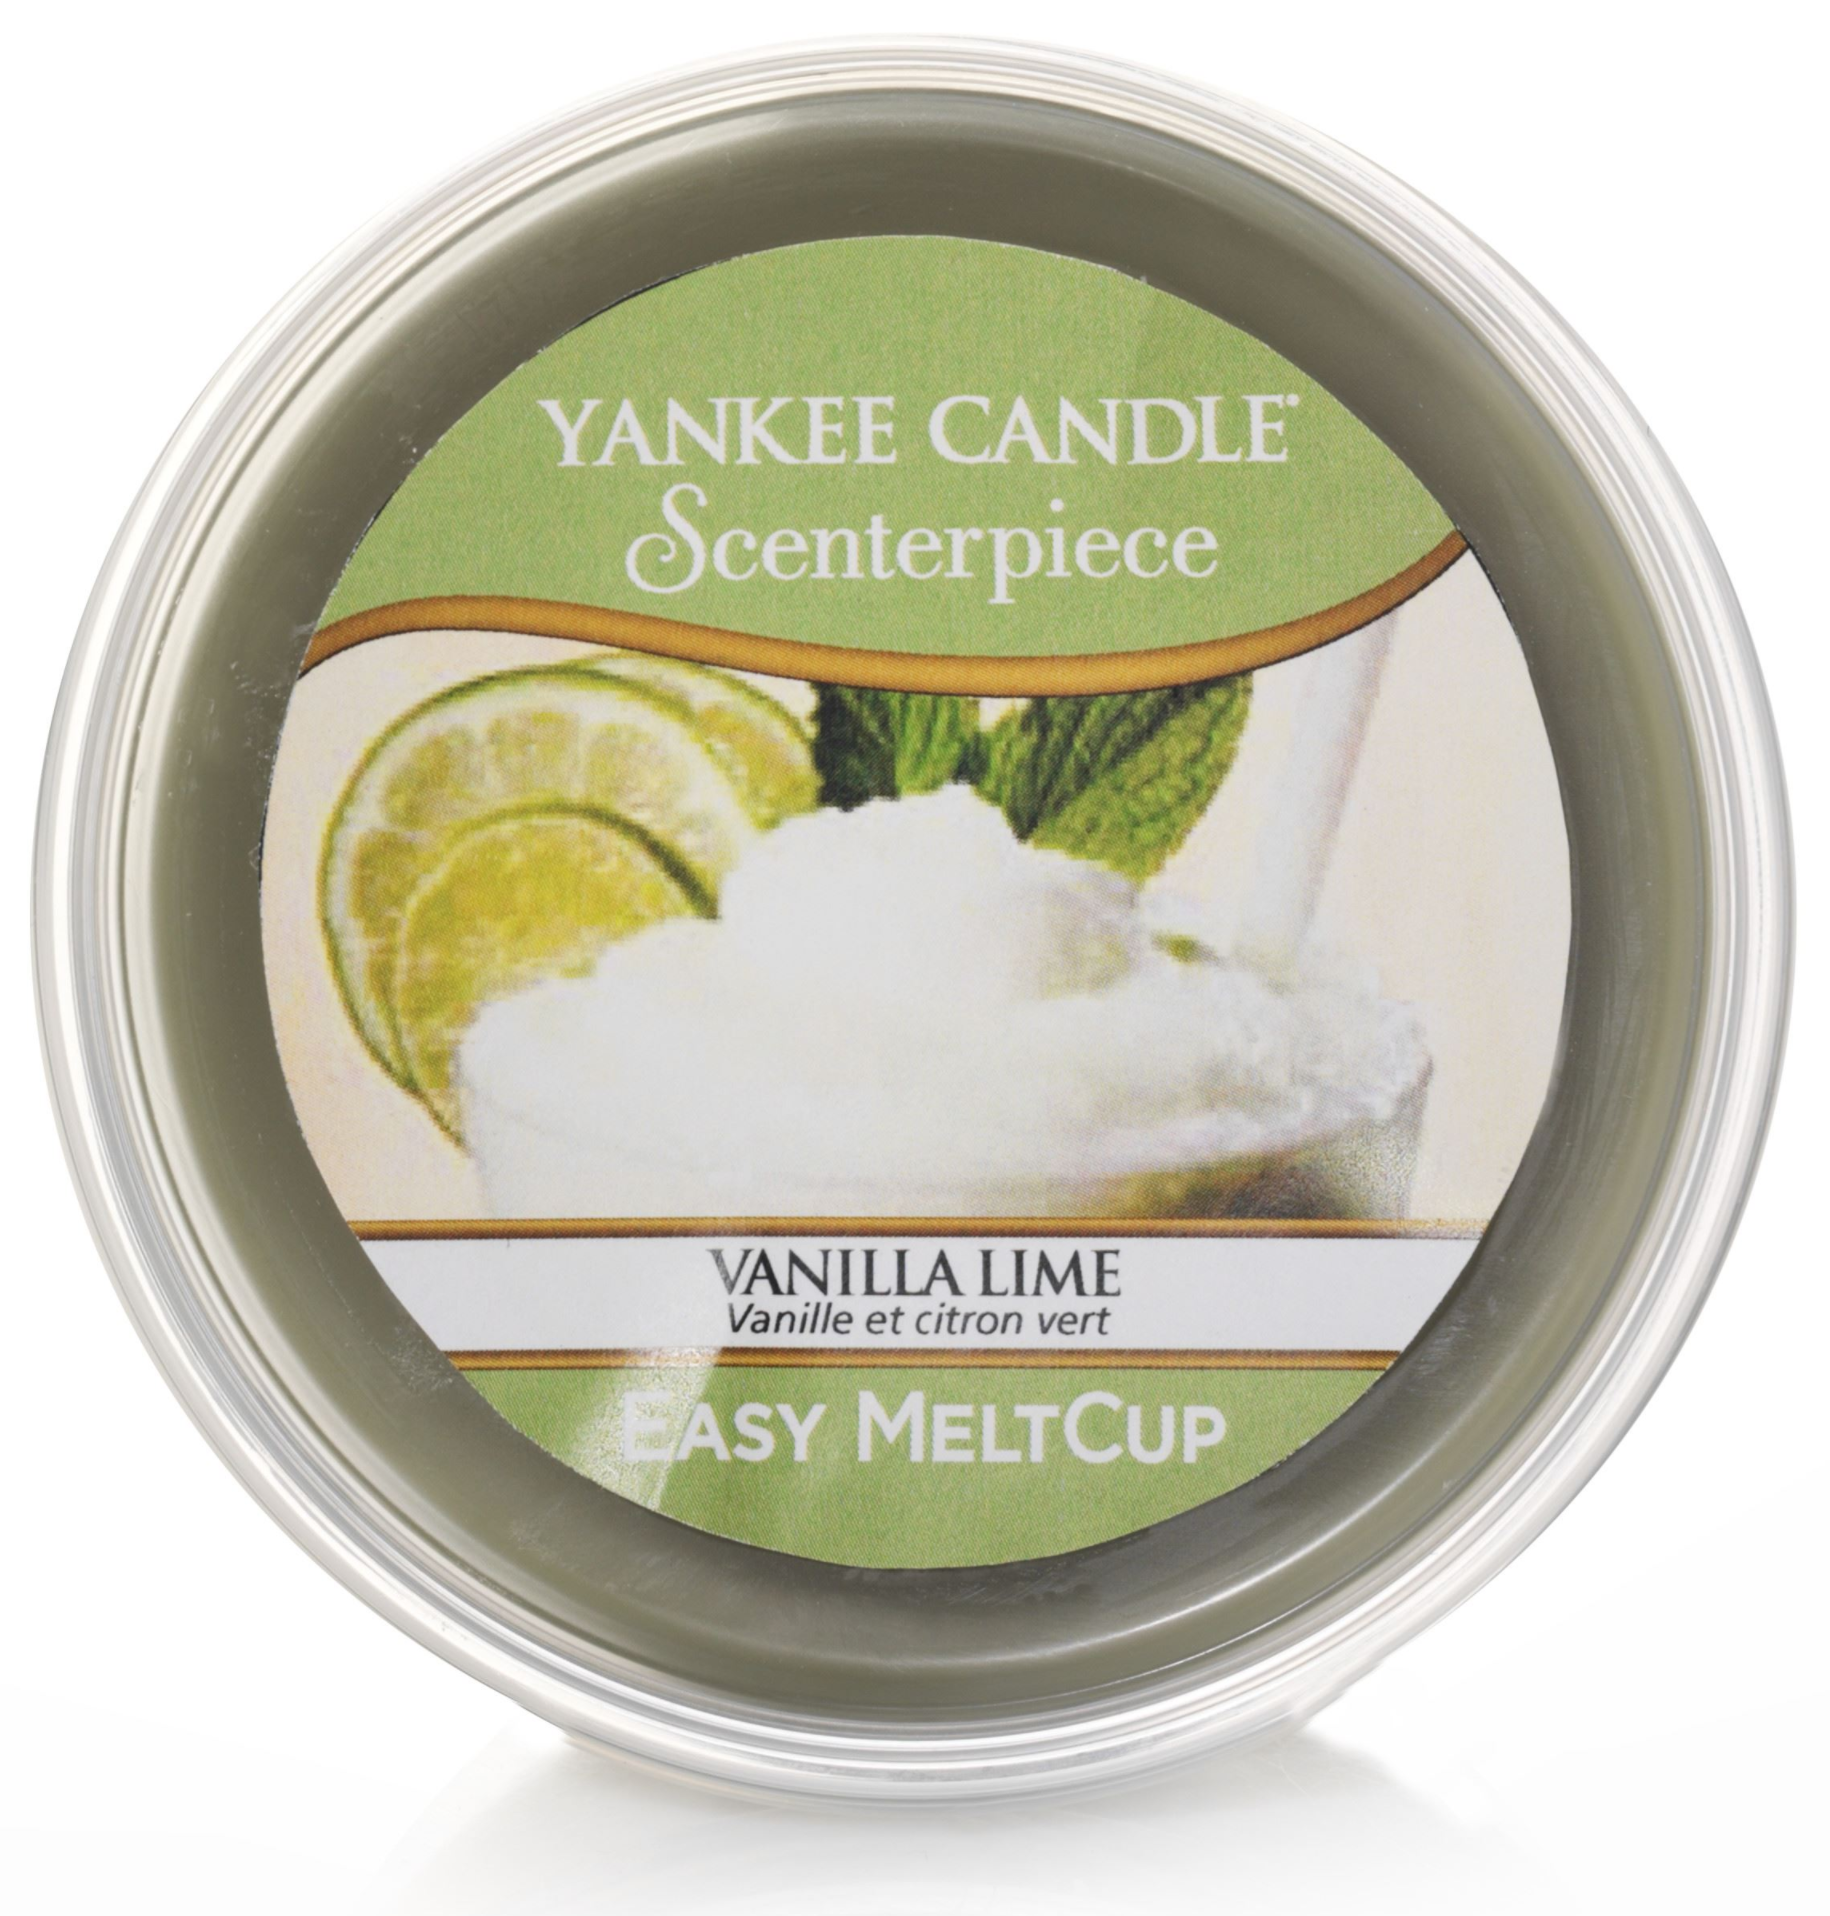 Vanilla Lime Scenterpiece Easy Meltcup